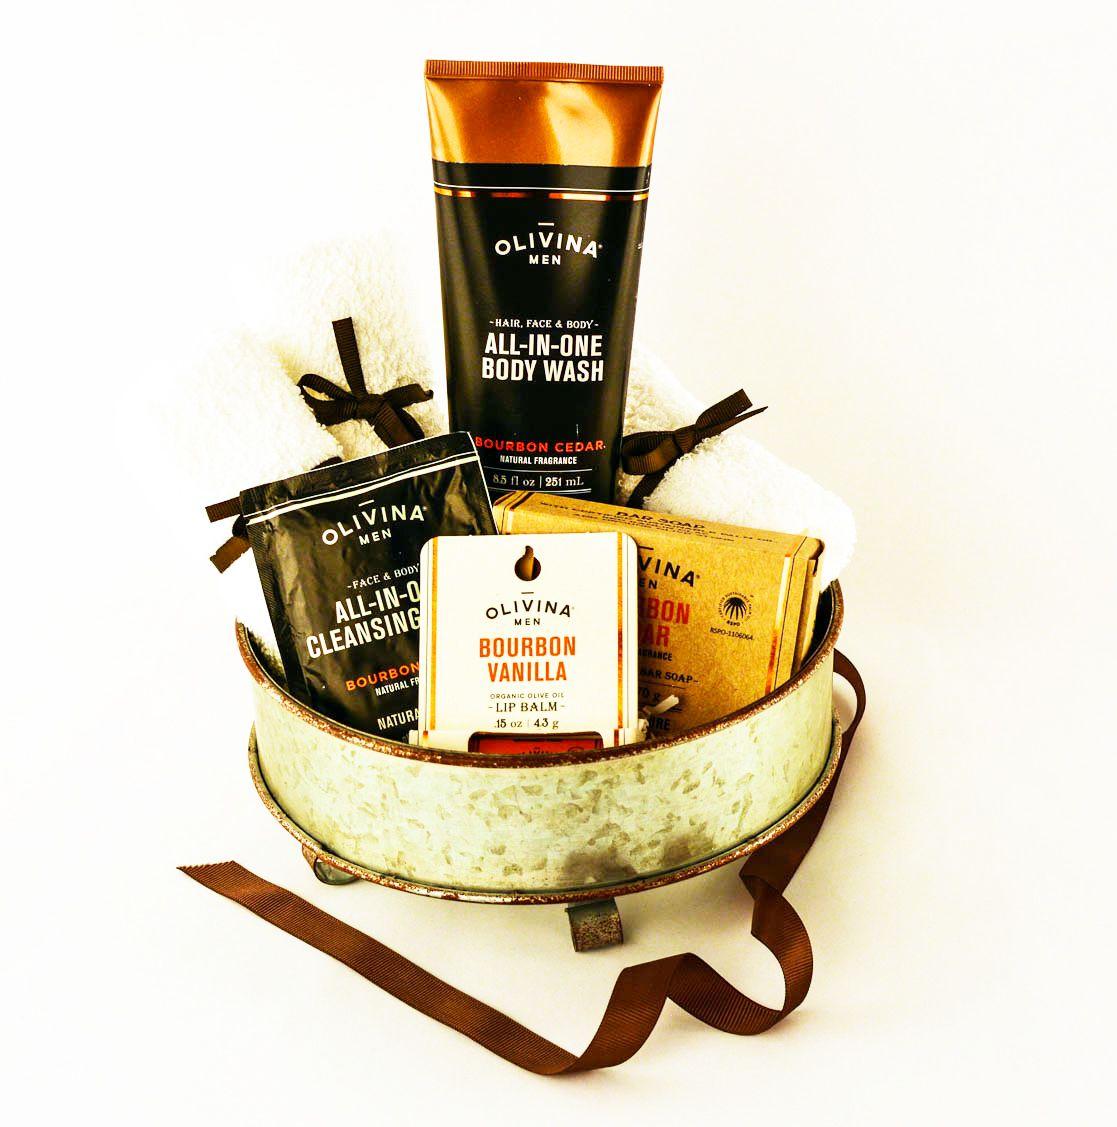 Bourbon spa gift basket baskettude gift baskets with